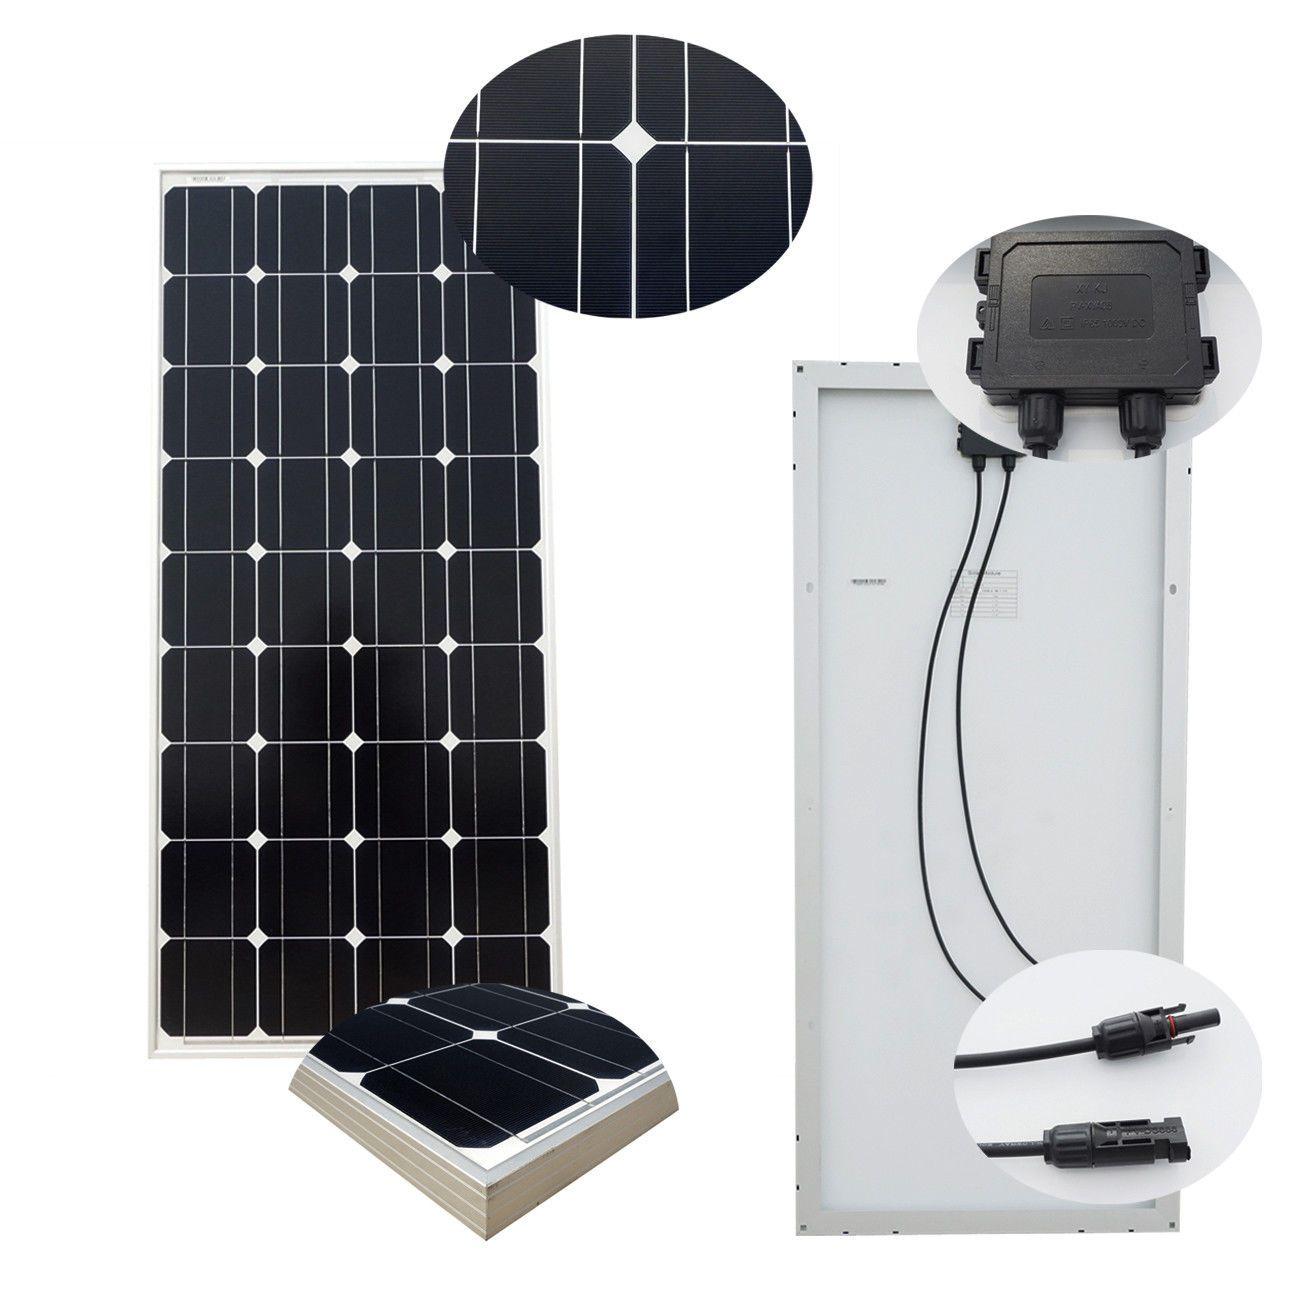 100w 200w 300w 400w 500w 600w 1kw Solar Panel System For Rv Home Battery Charger Solar Kit Solar Panel Kits Solar Panels